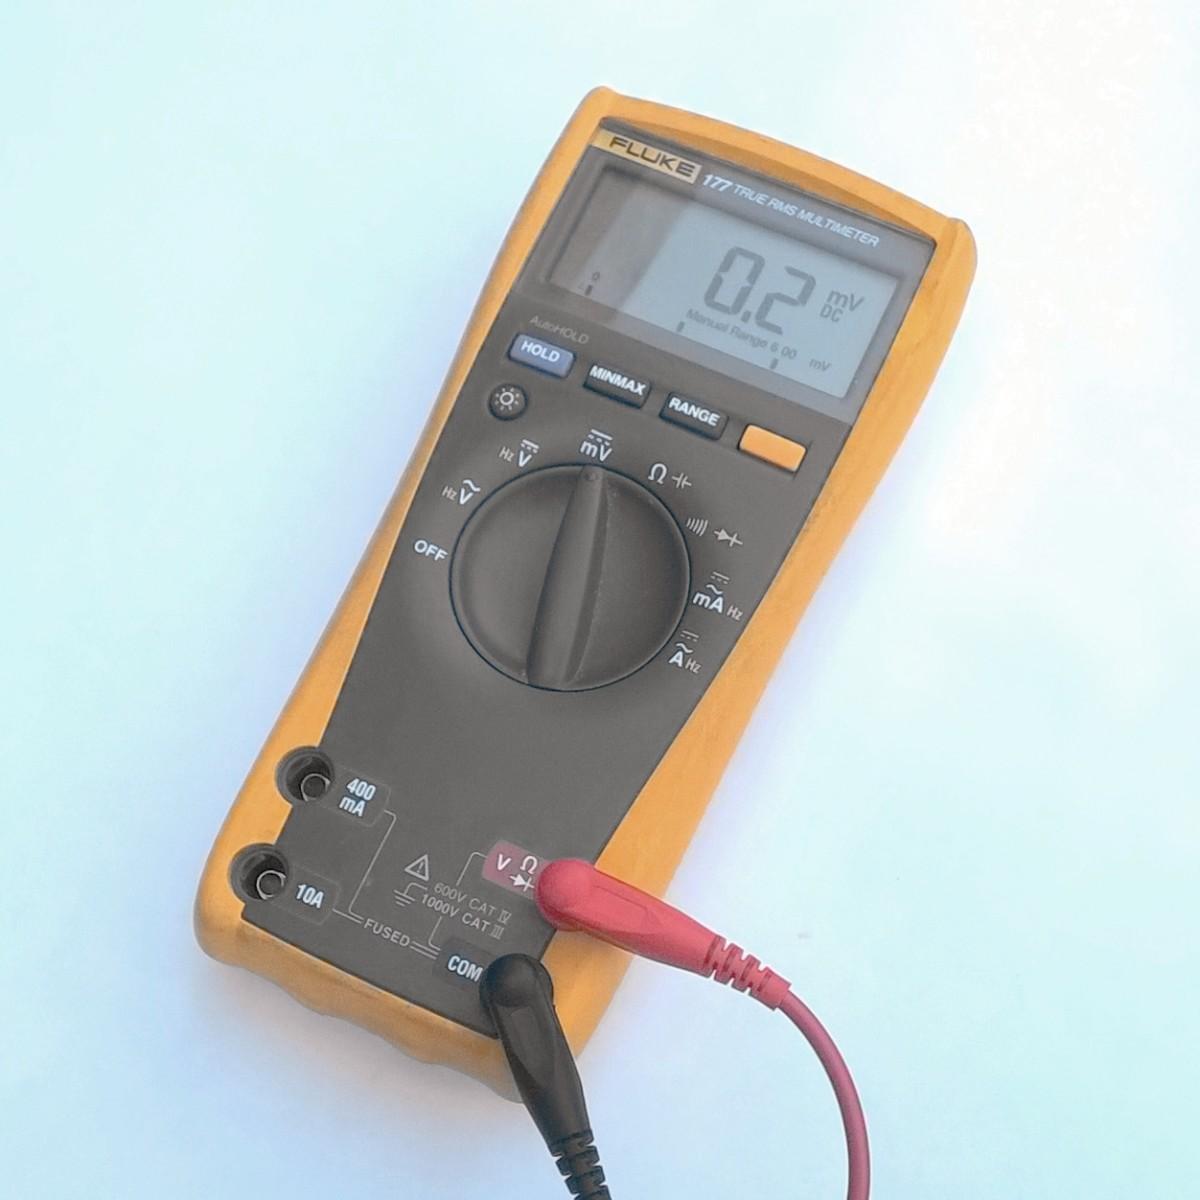 Multimeter measurement Cable Test Cable Probe Measuring Lines Test Cable Multi Meter